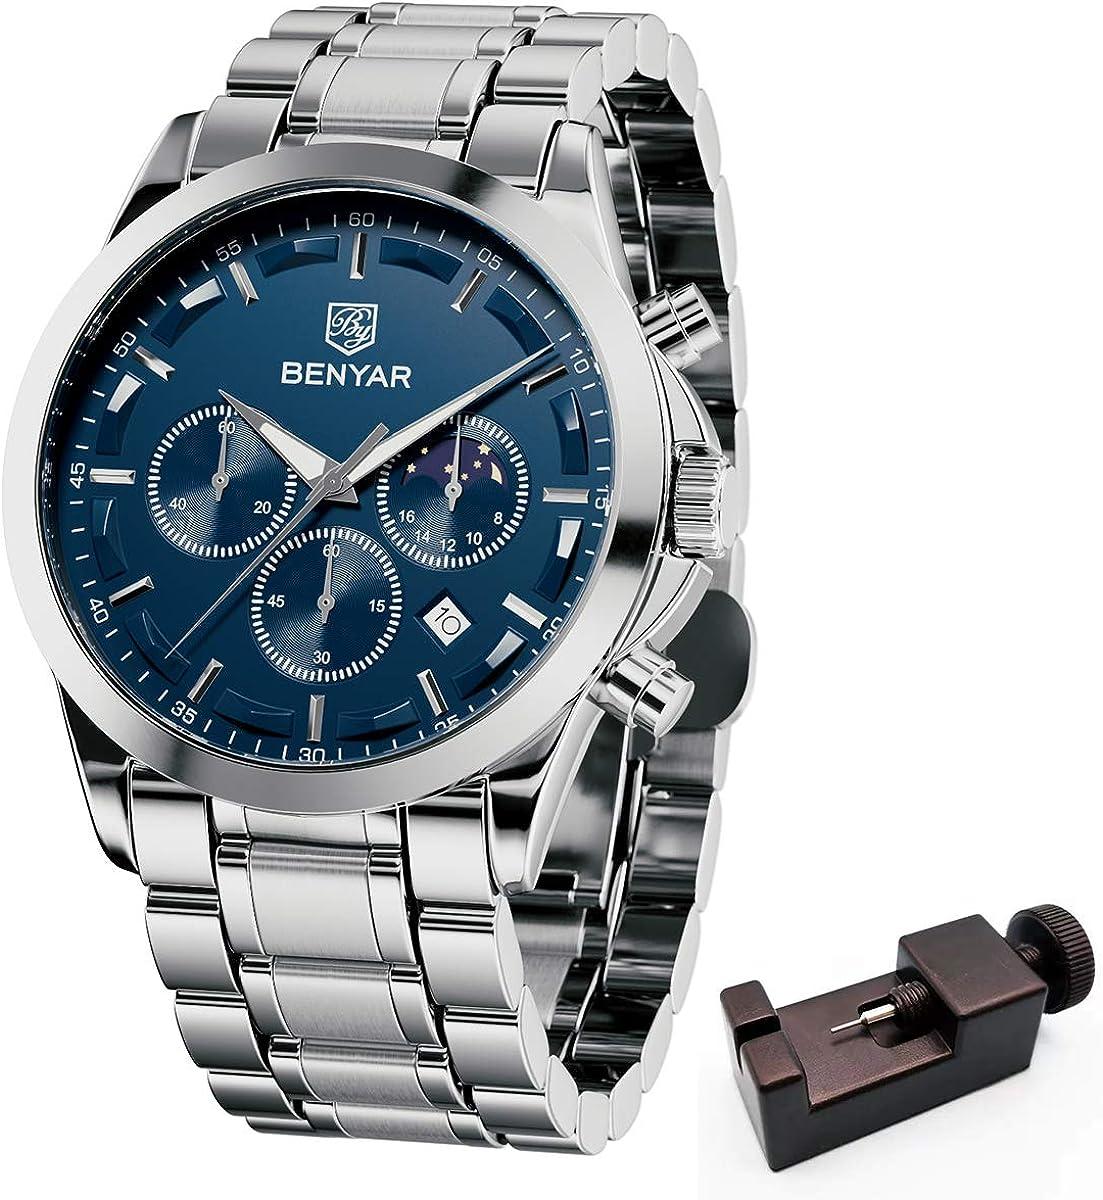 BENYAR - Wrist Watch for Men, Genuine Leather Strap Watches, Quartz Movement, Waterproof Analog Chronograph Watches